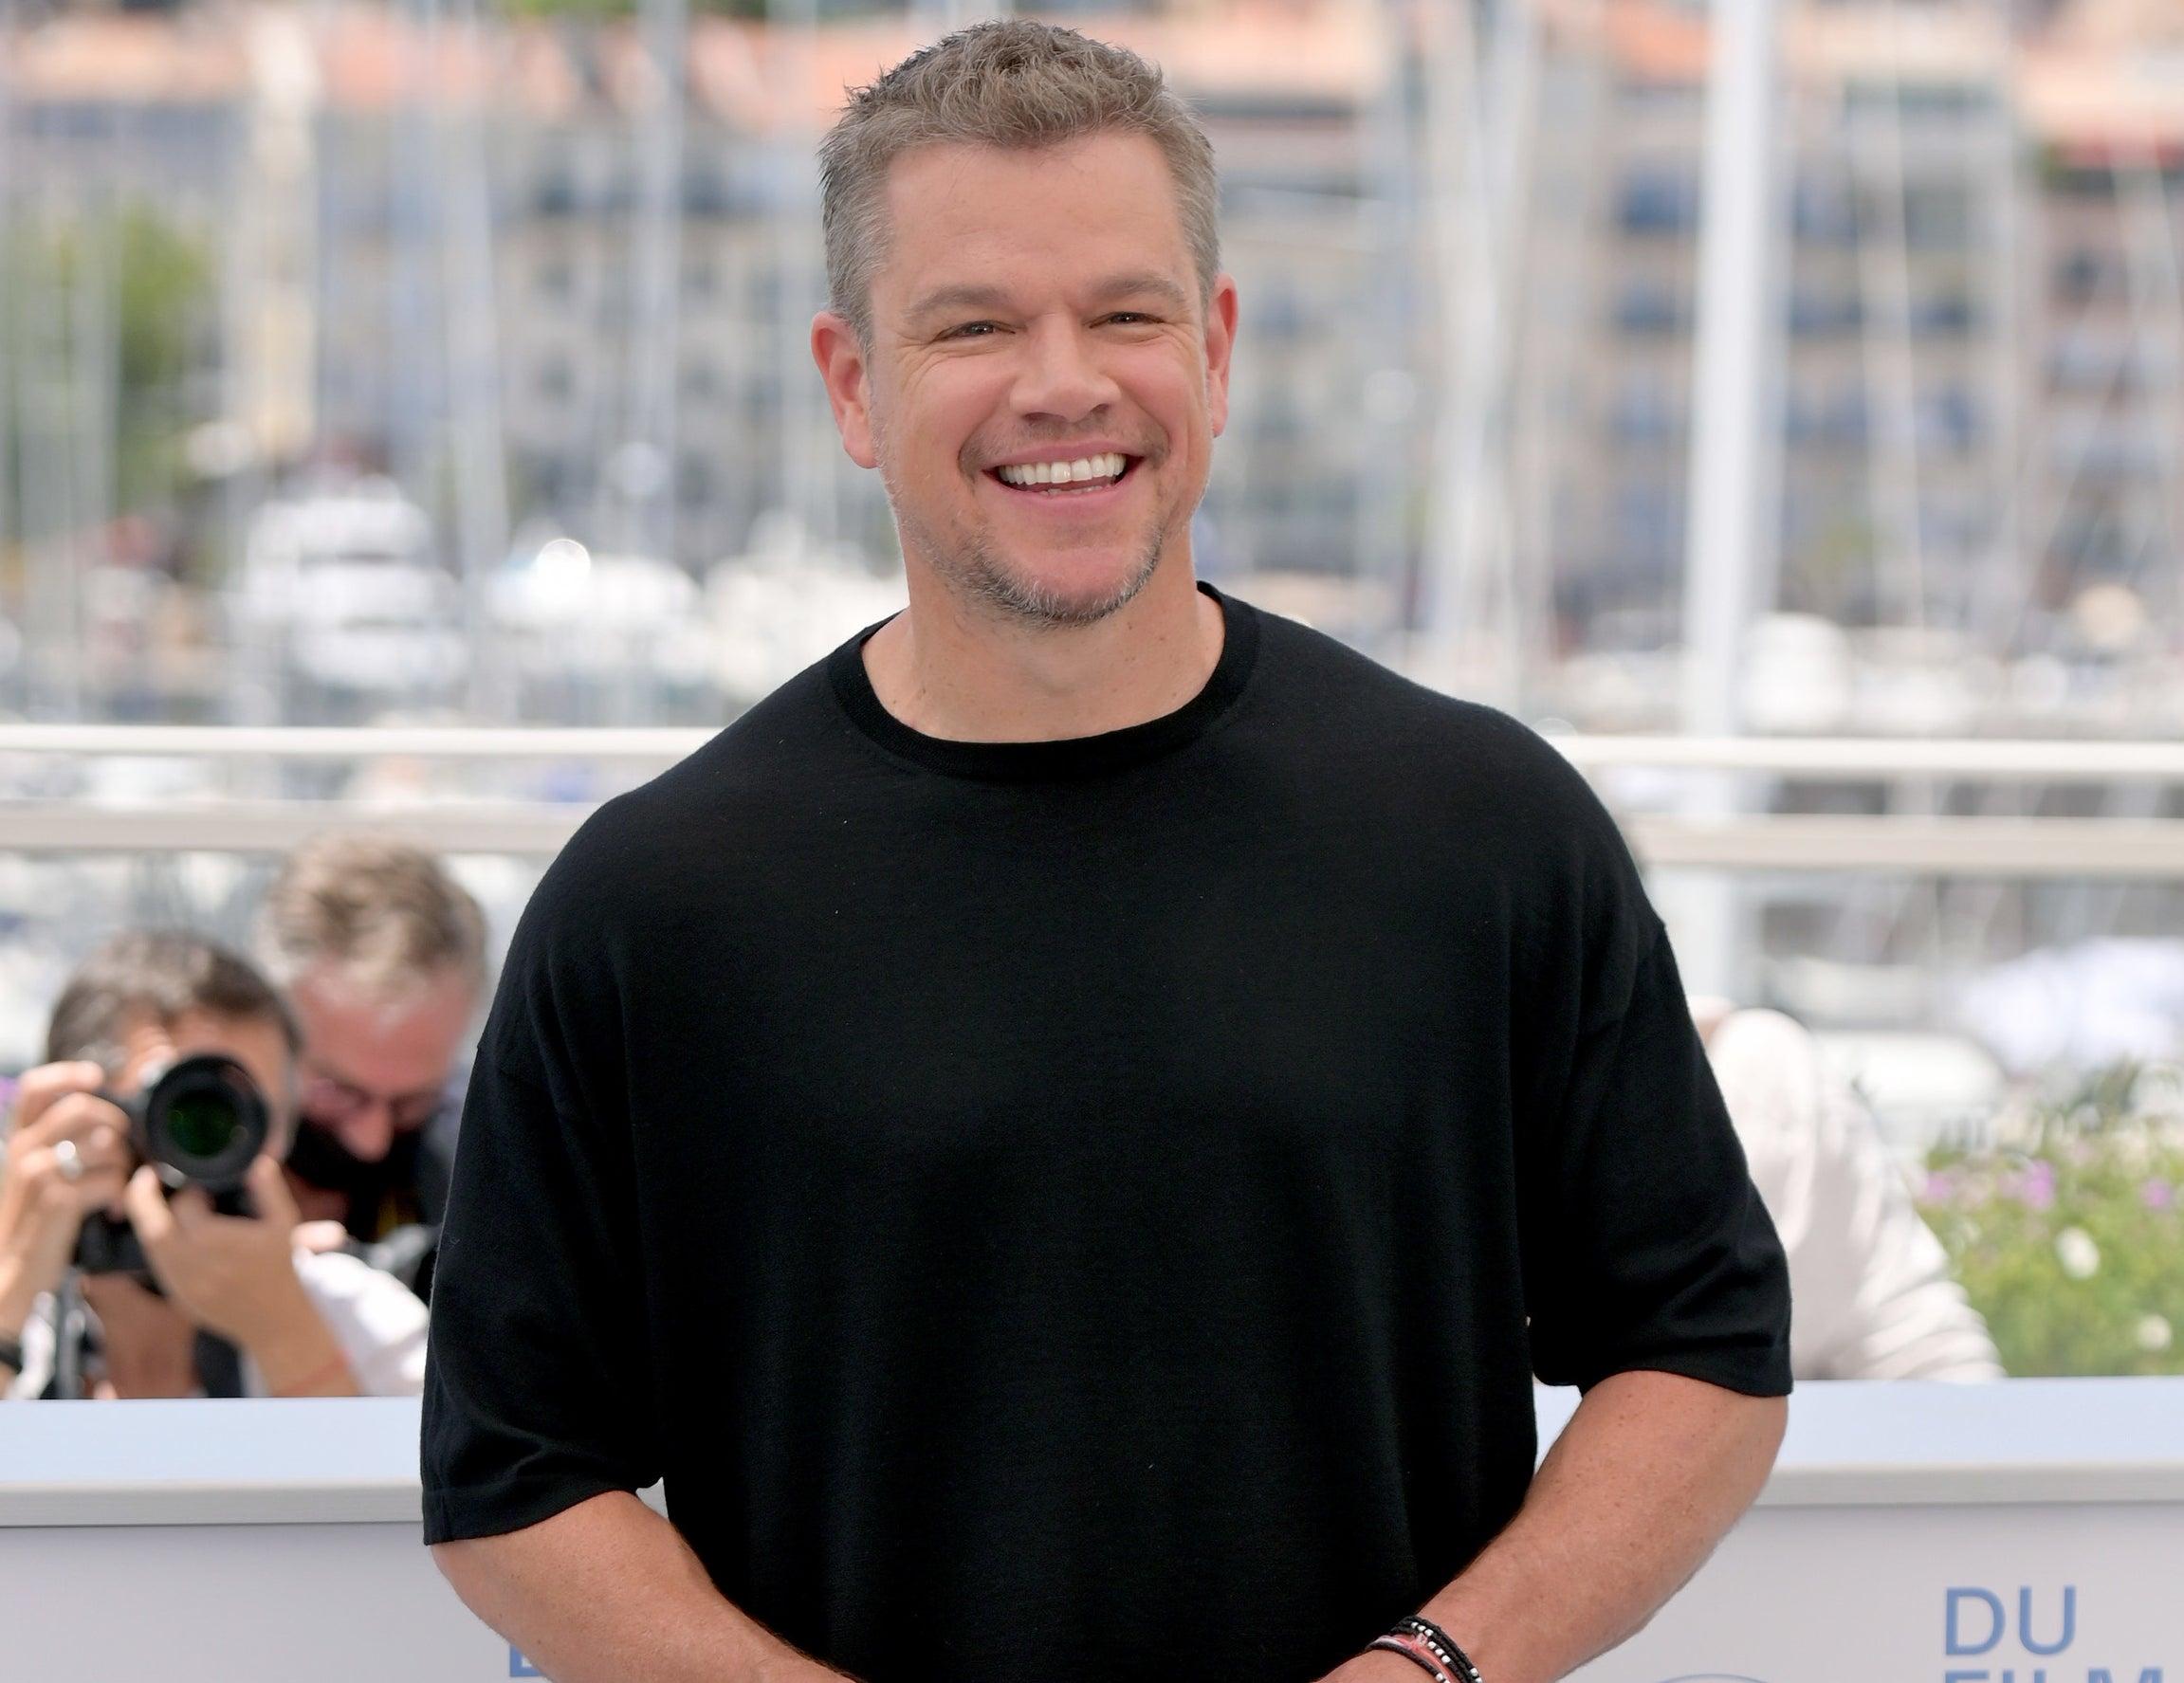 Matt laughs while wearing a black t-shirt outside